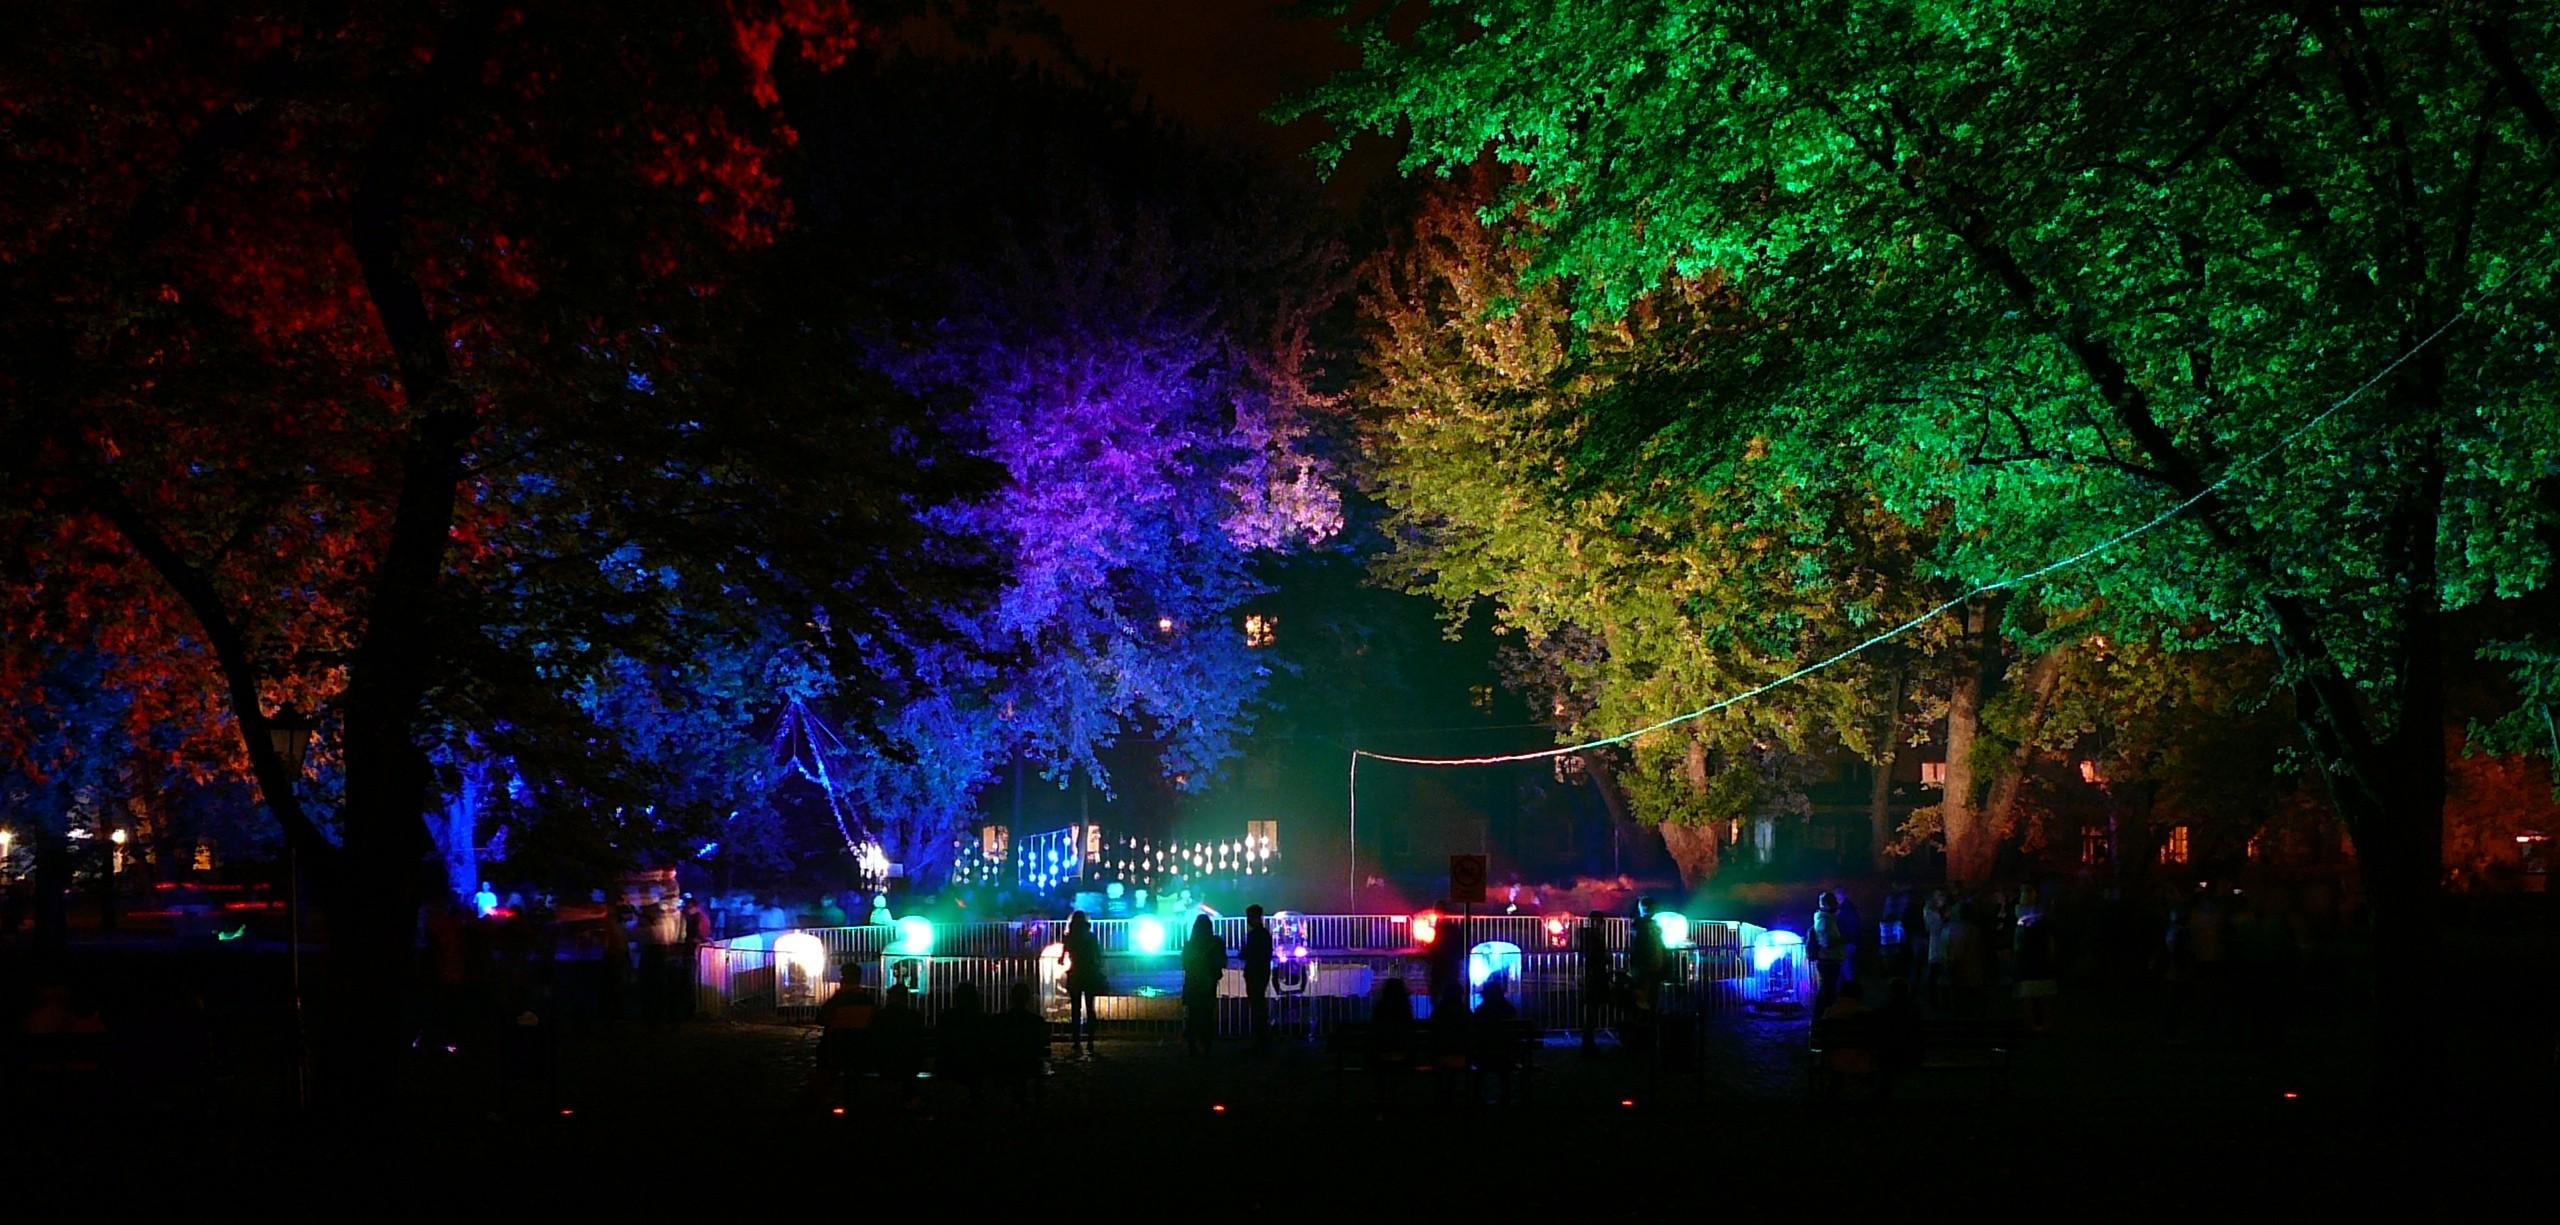 Weihnachtsbeleuchtung Bunt.Hintergrundbilder Bäume Beleuchtung Bunt Nacht Park